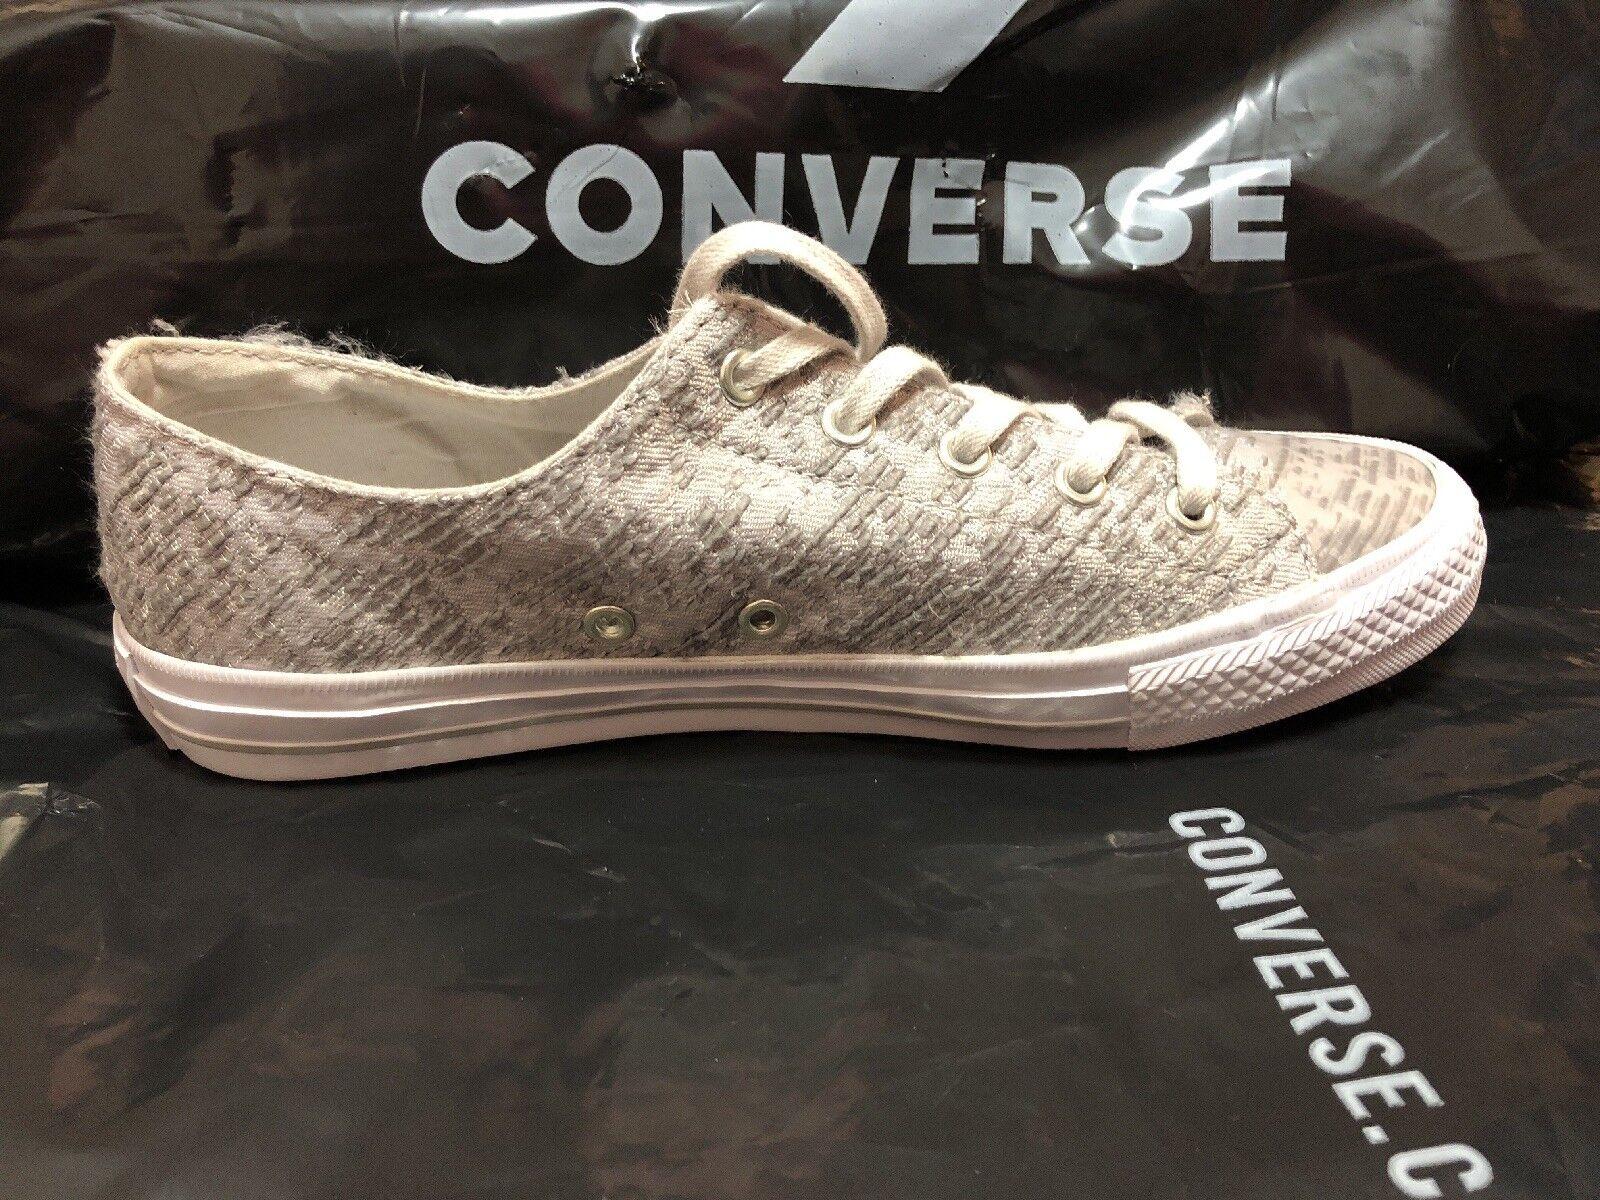 Converse 553451C 553451C Converse Gemma Ox Mouse Dolphin Egret Damens Größe 8 f692e6